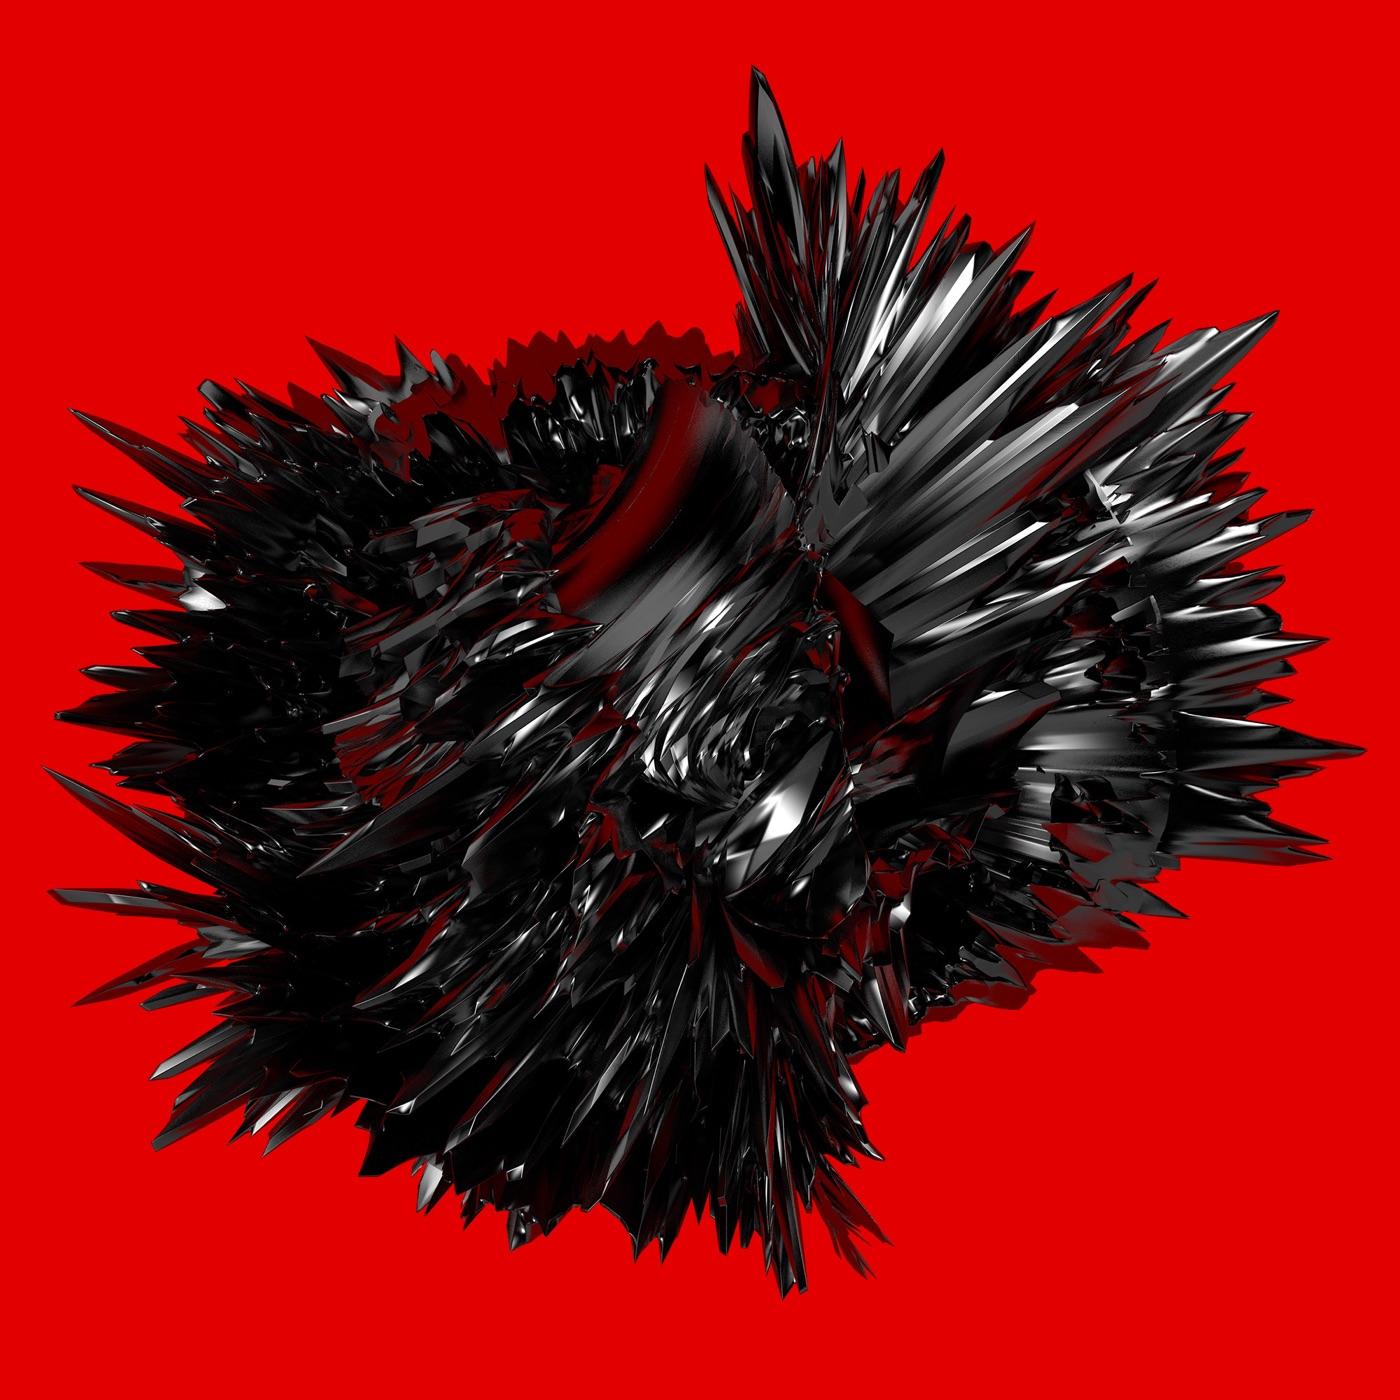 Frontierer - The Molten Larva [Bonus Track] (2019)